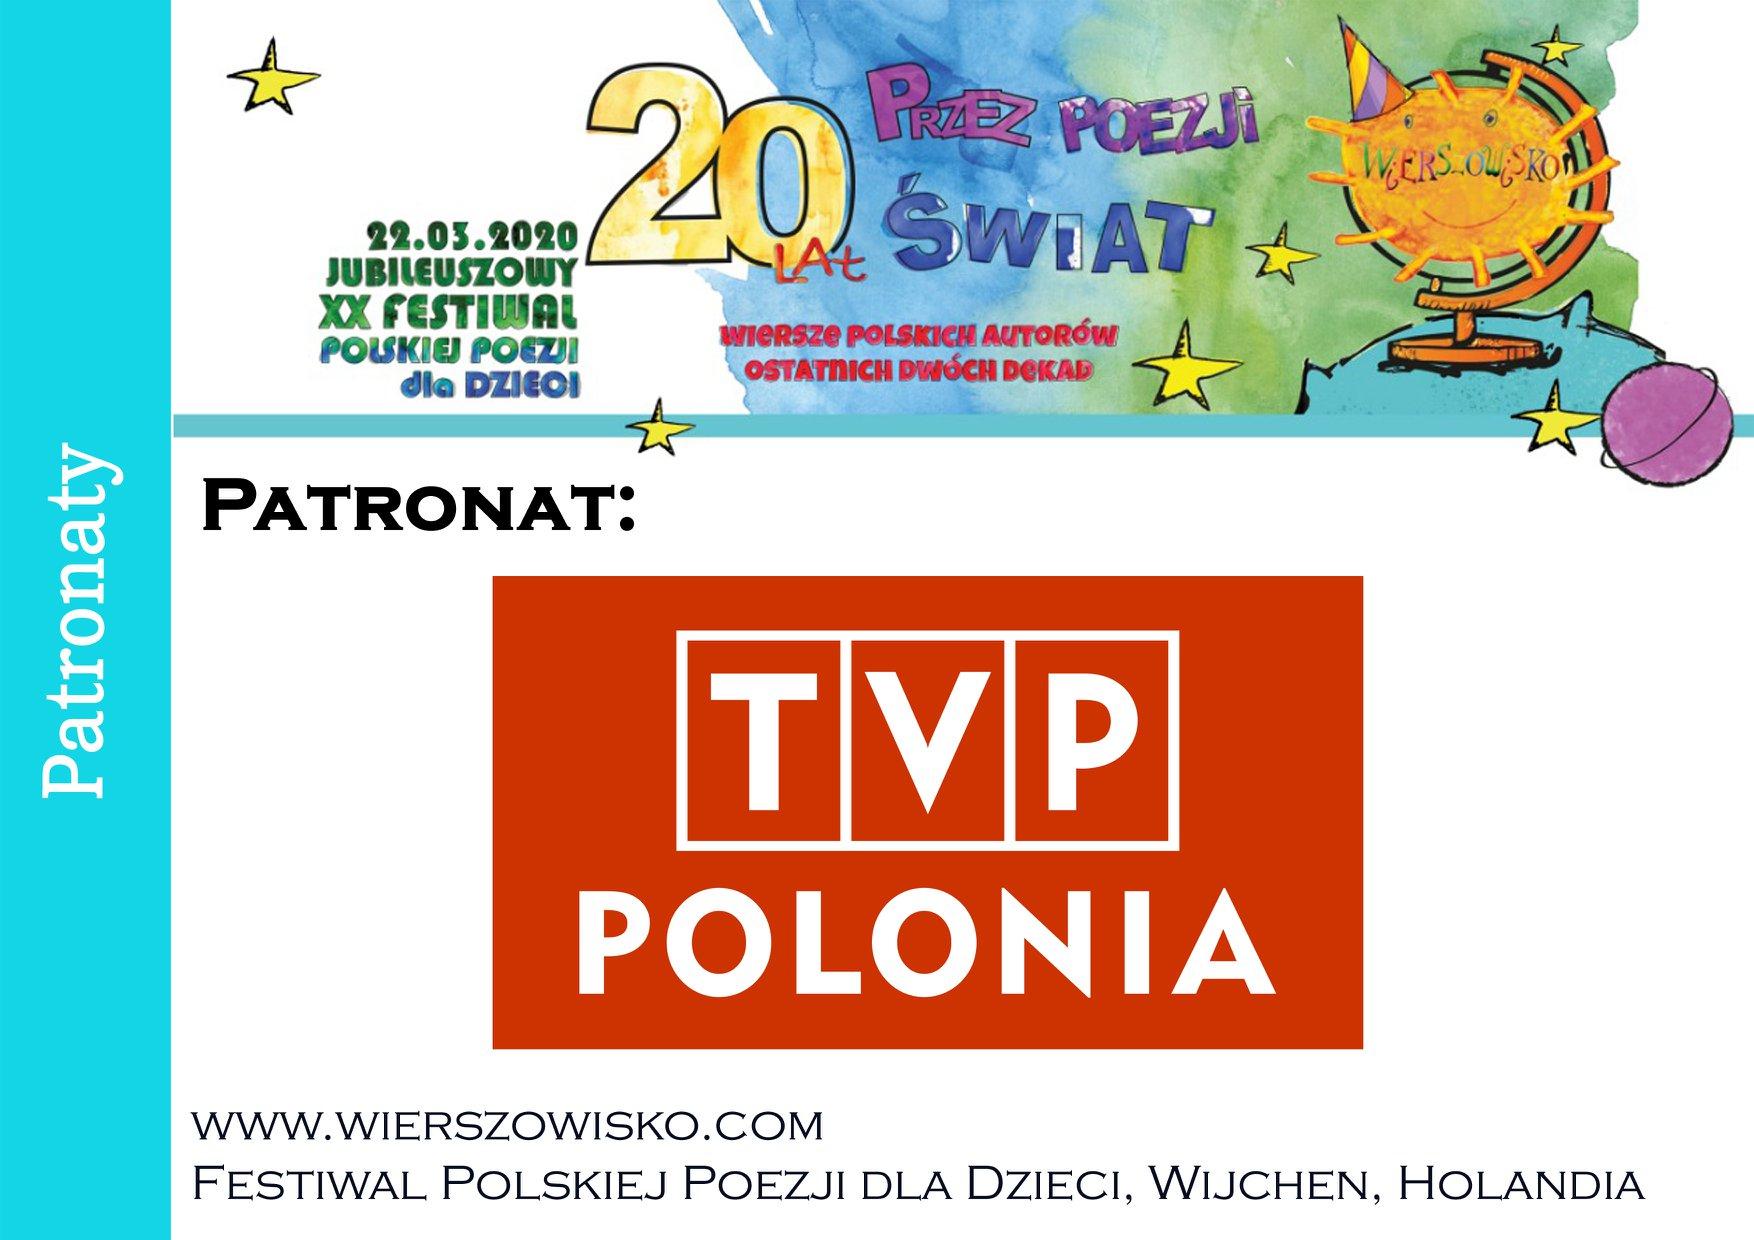 TV Polonia